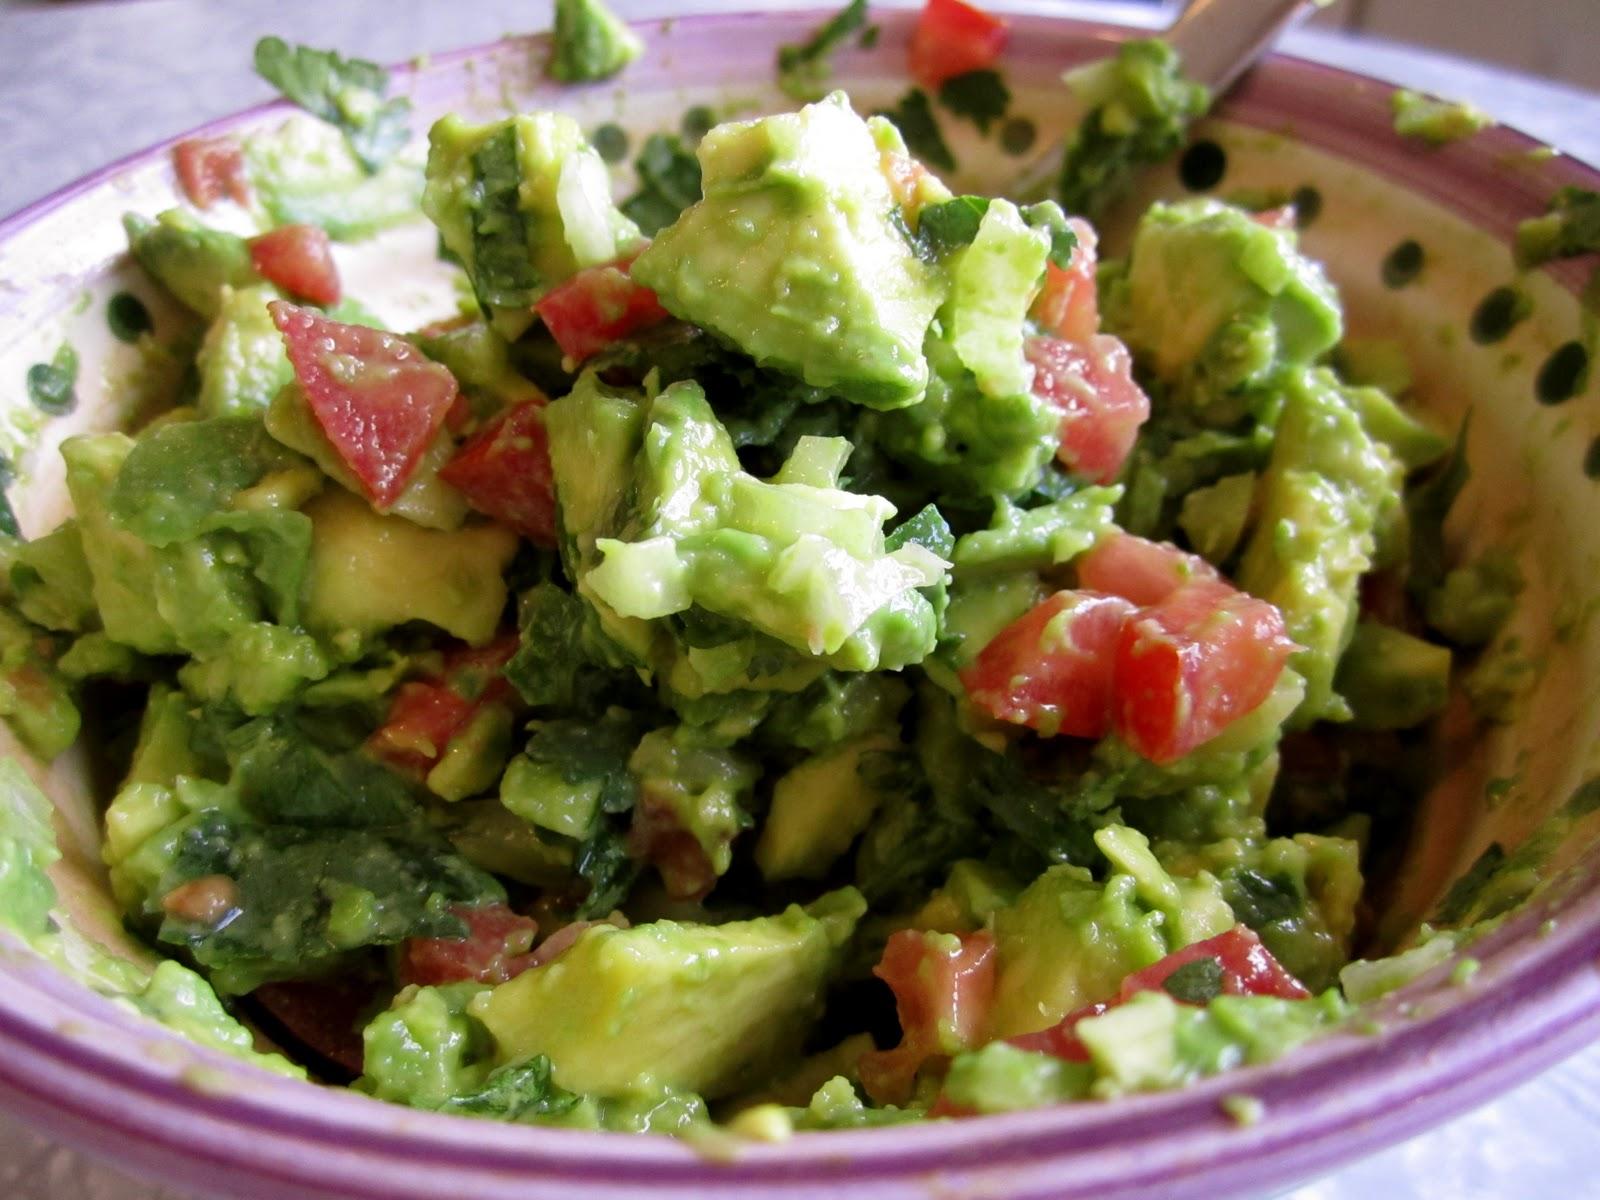 Gluten Free Betty: 6th Day of Christmas Treats: Christmas Guacamole